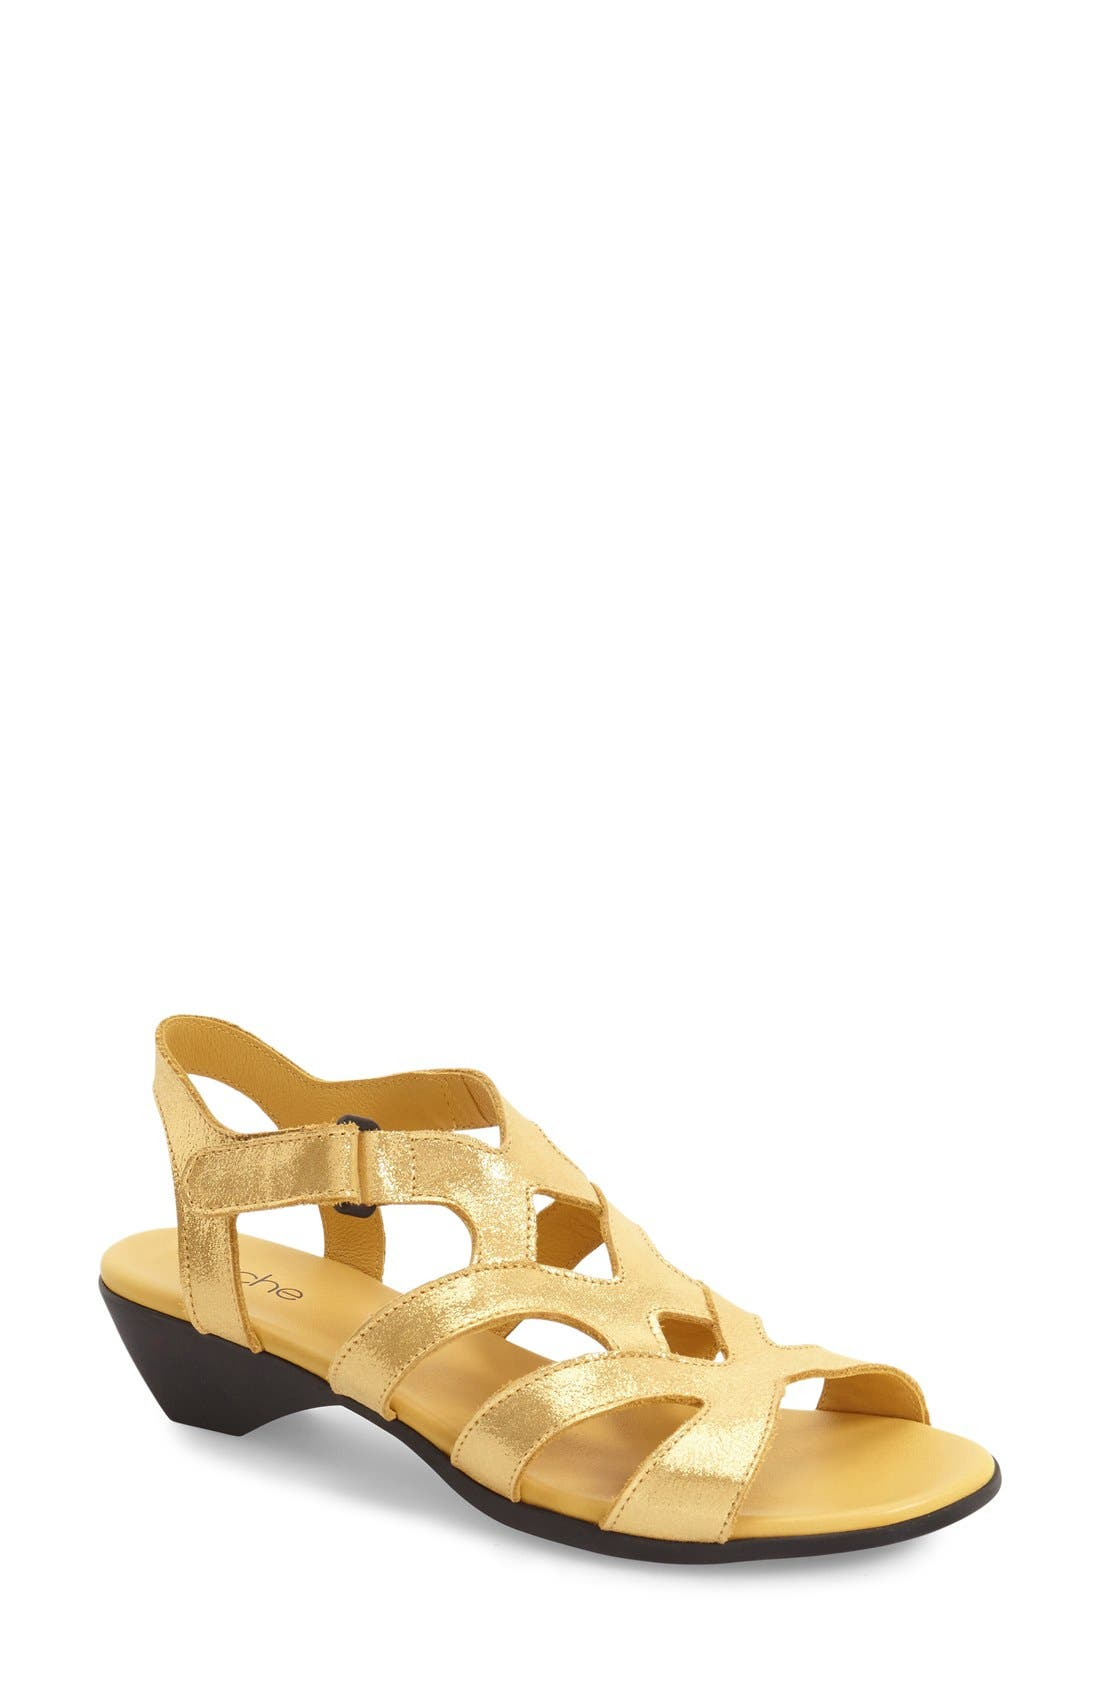 'Obela' Water Resistant Leather Sandal,                             Main thumbnail 6, color,